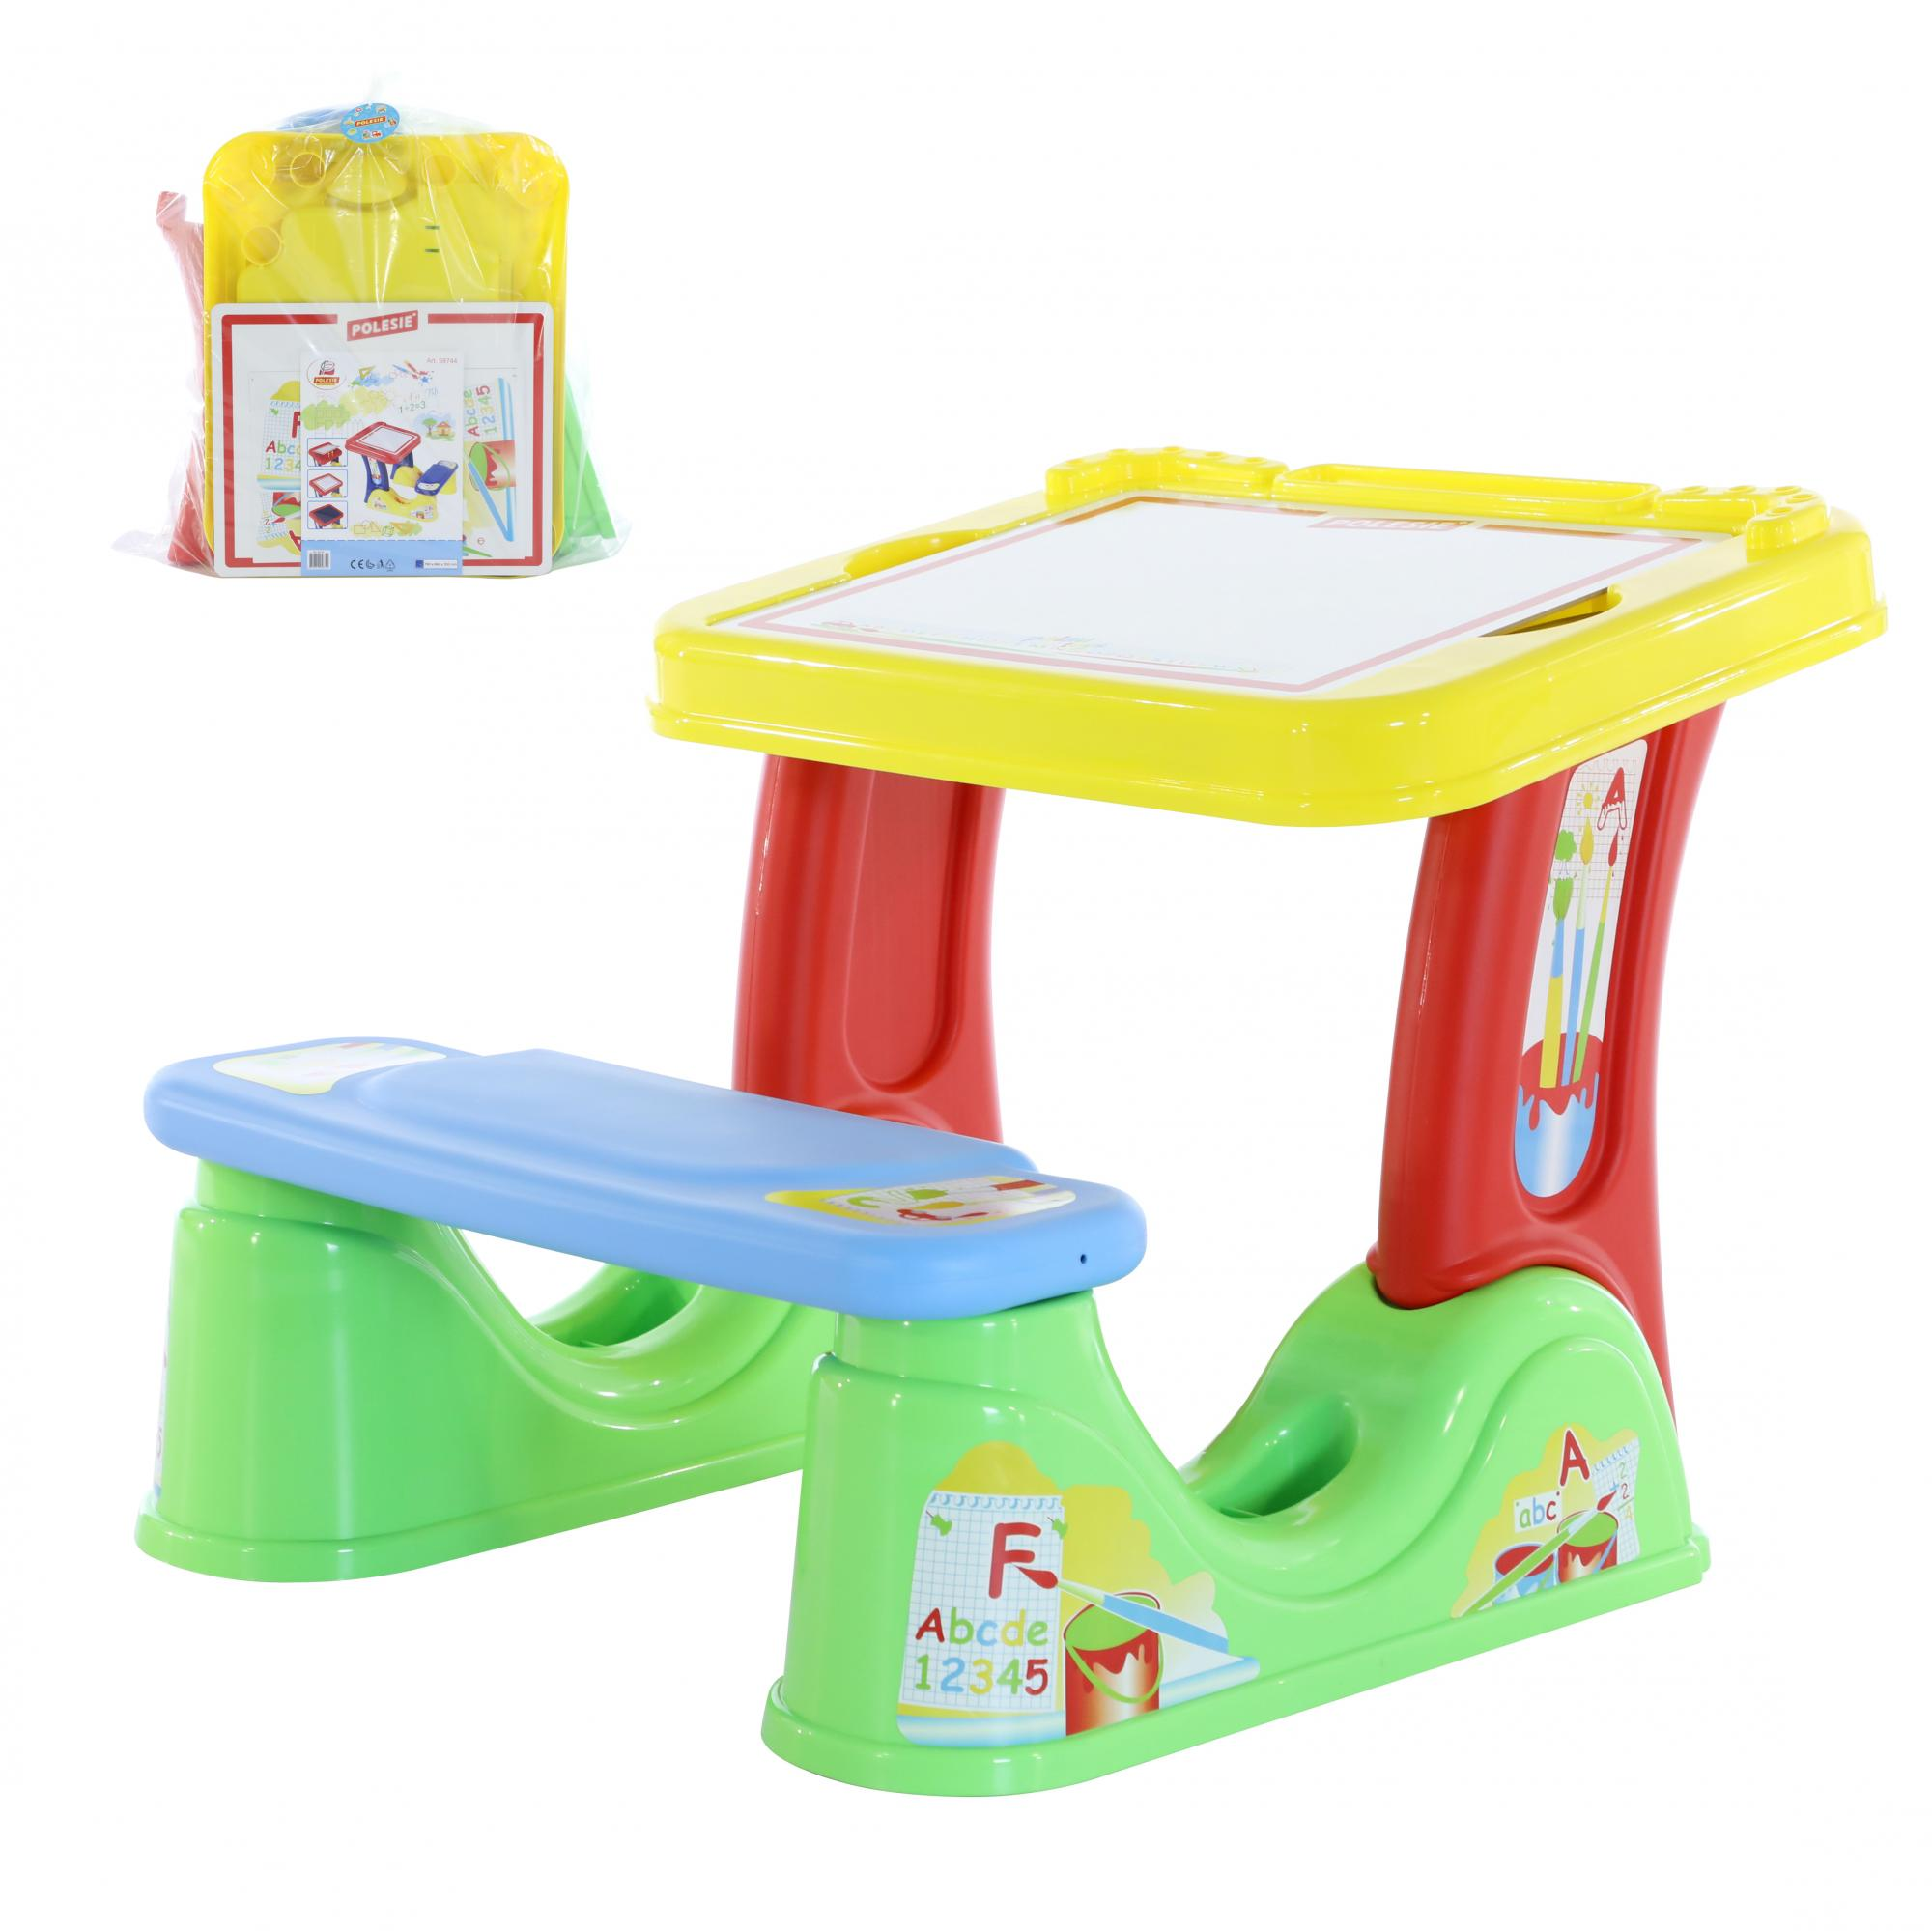 School Sets Palau Toys  Set preschooler (package) for kids games for boys and girls for children toys children's office for school